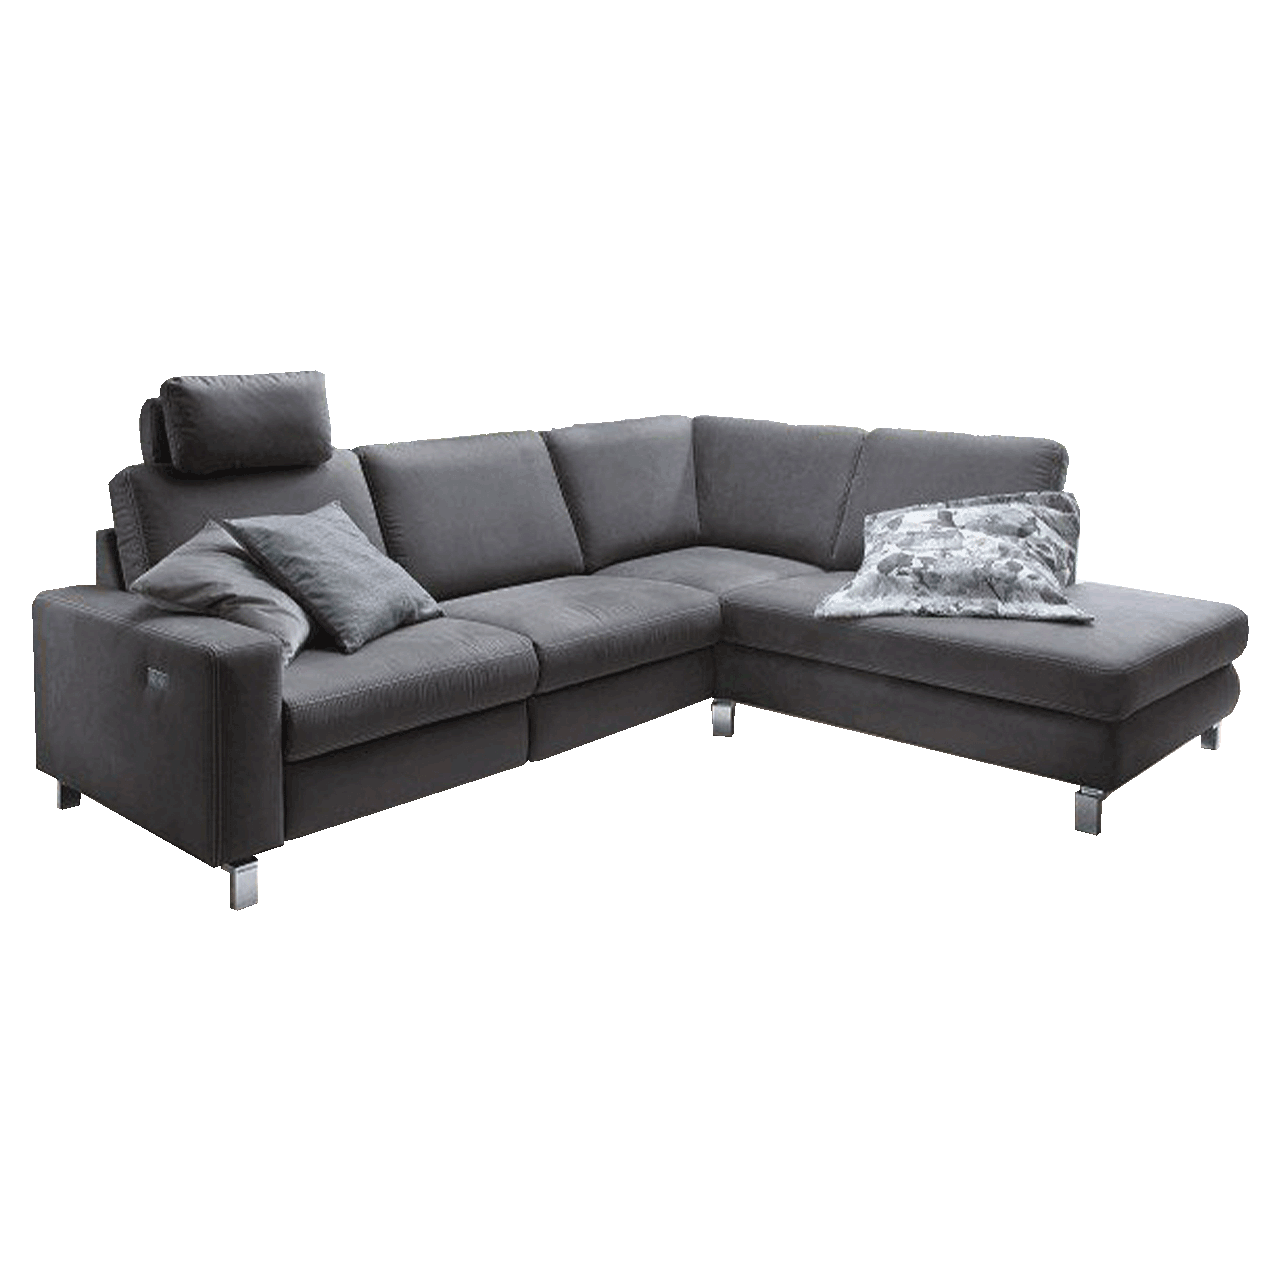 Sofa TL 1360 PLUS